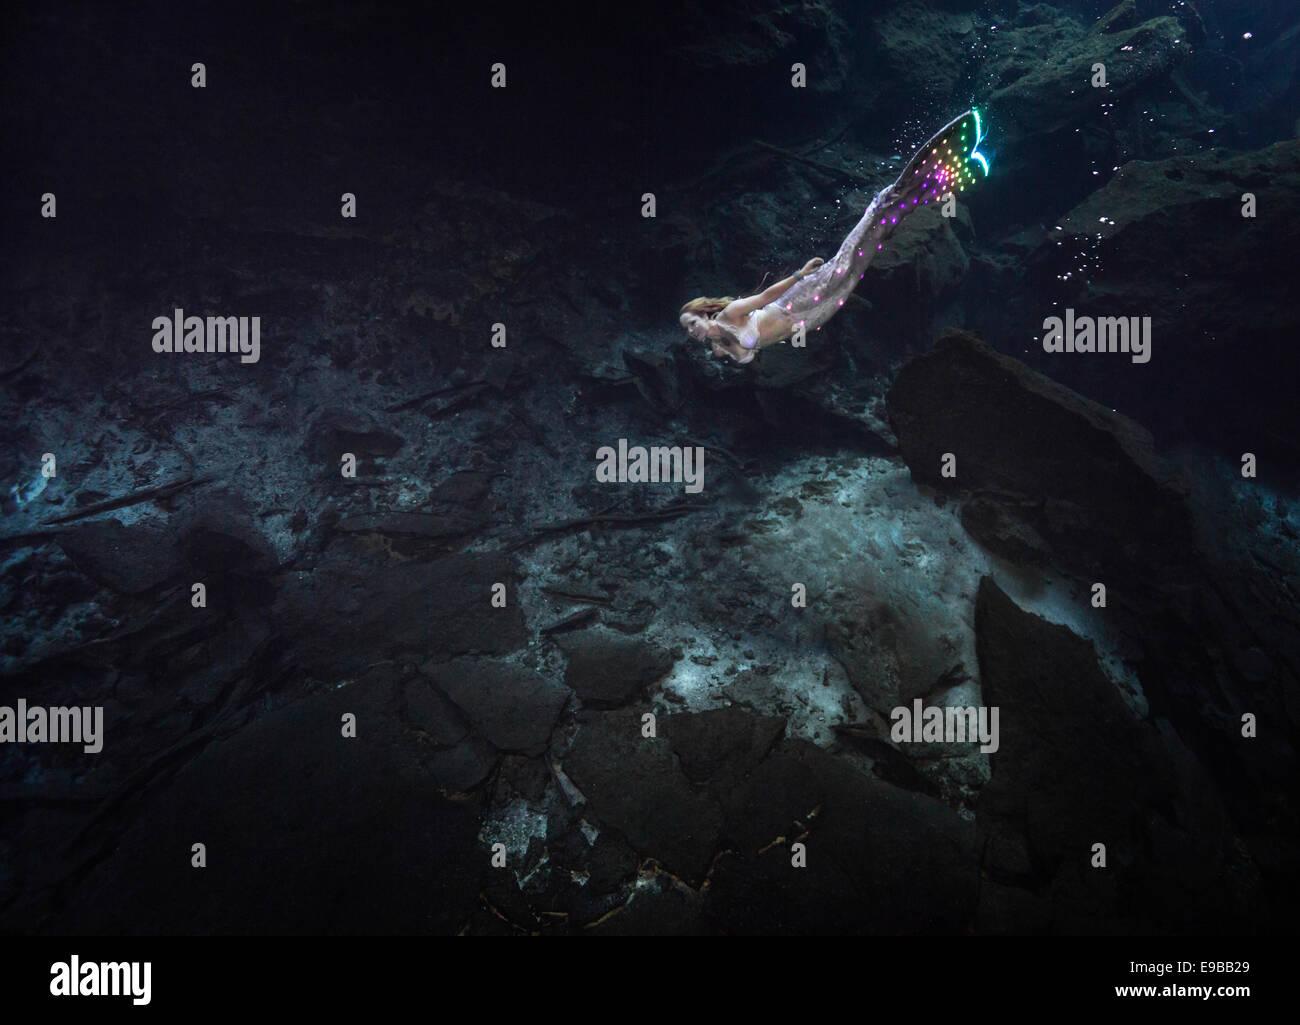 Mermaid with a glowing fluke swimming through the waters of Yucatan Peninsula, KuKulKan Cenote, QRoo, Mexico - Stock Image